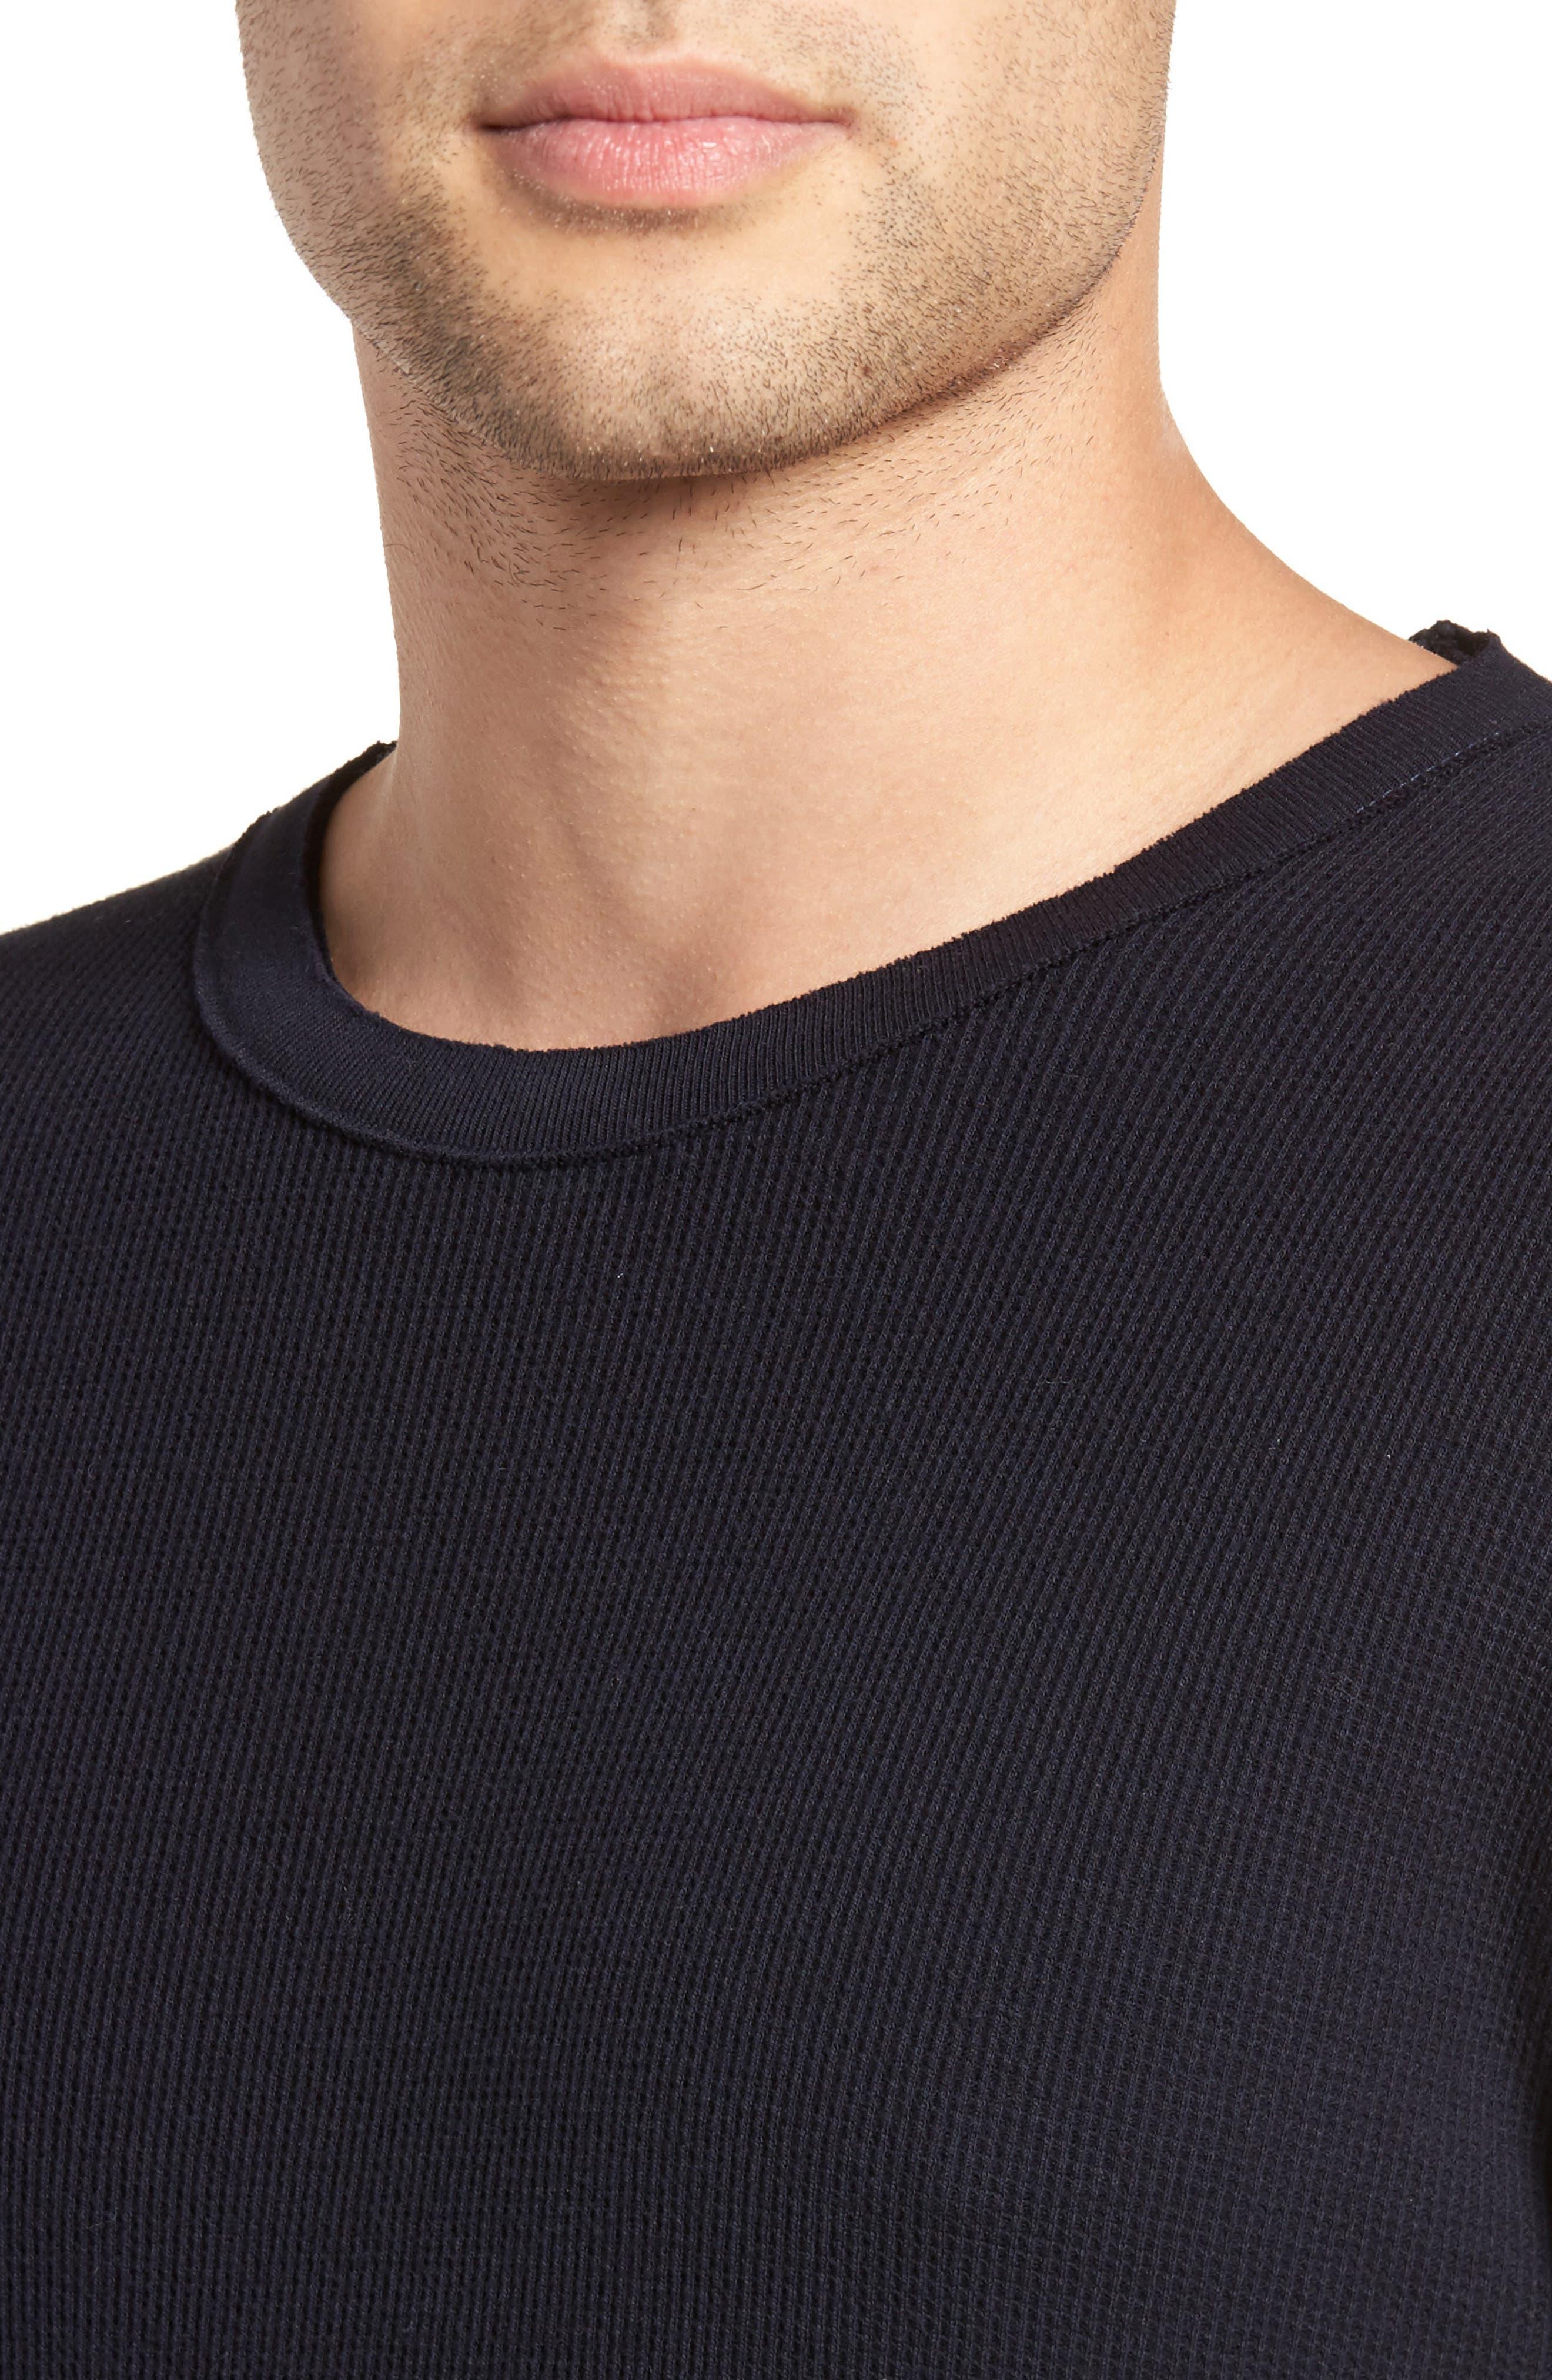 Thermal Knit Long Sleeve T-Shirt,                             Alternate thumbnail 12, color,